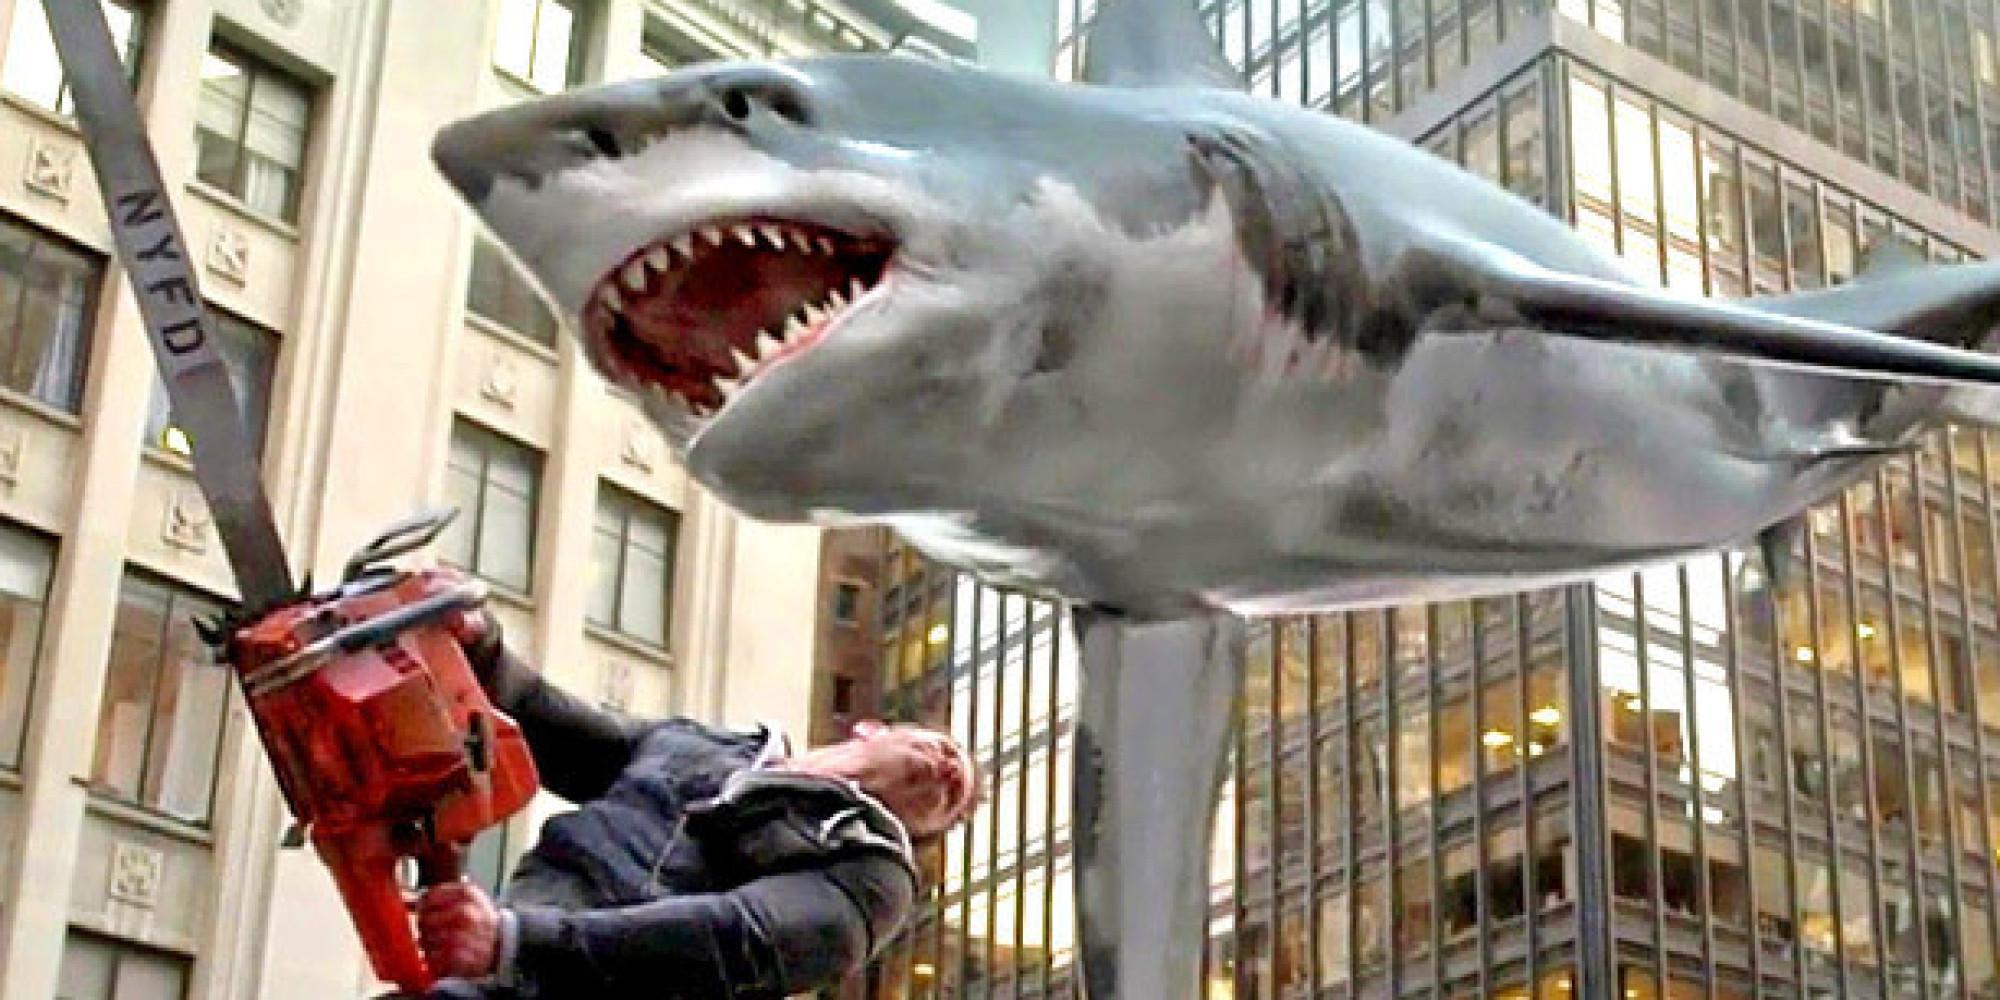 Sharknado 3 to be set in Washington, D.C. | Digital Trends